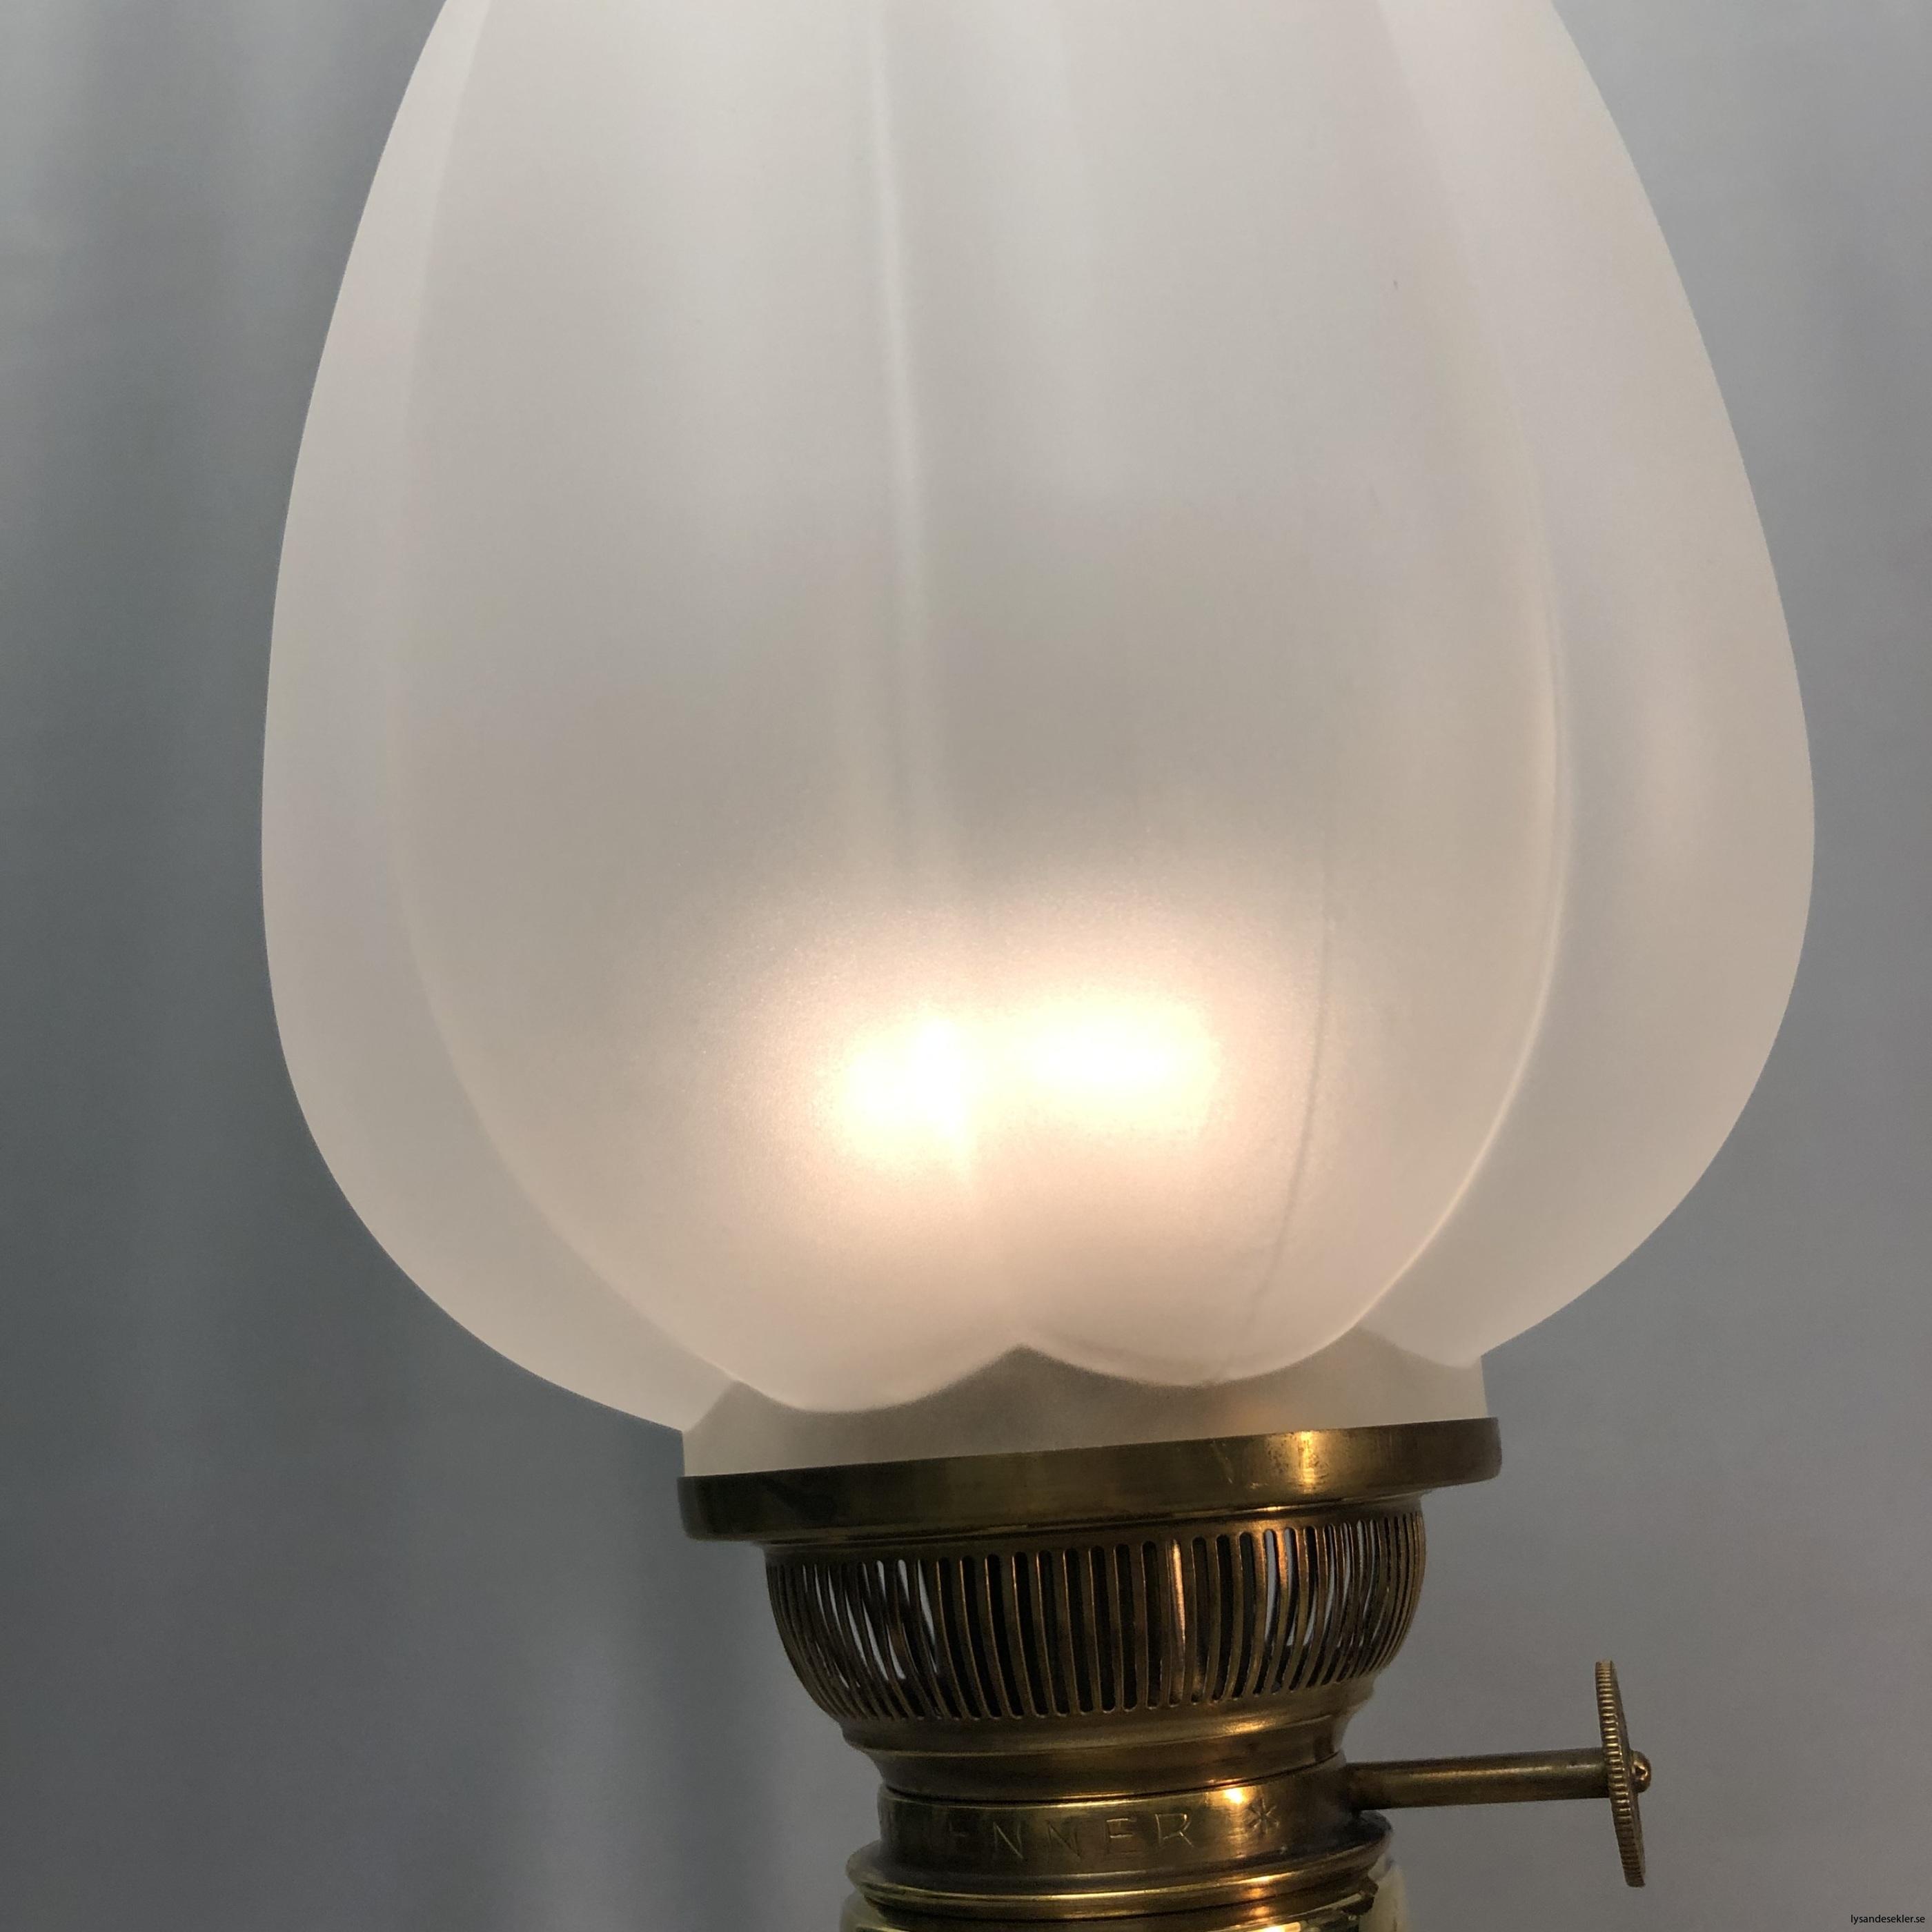 fotogenlampskupa kupa till fotogenlampa tulipan tulpan tulpankupor kupor26